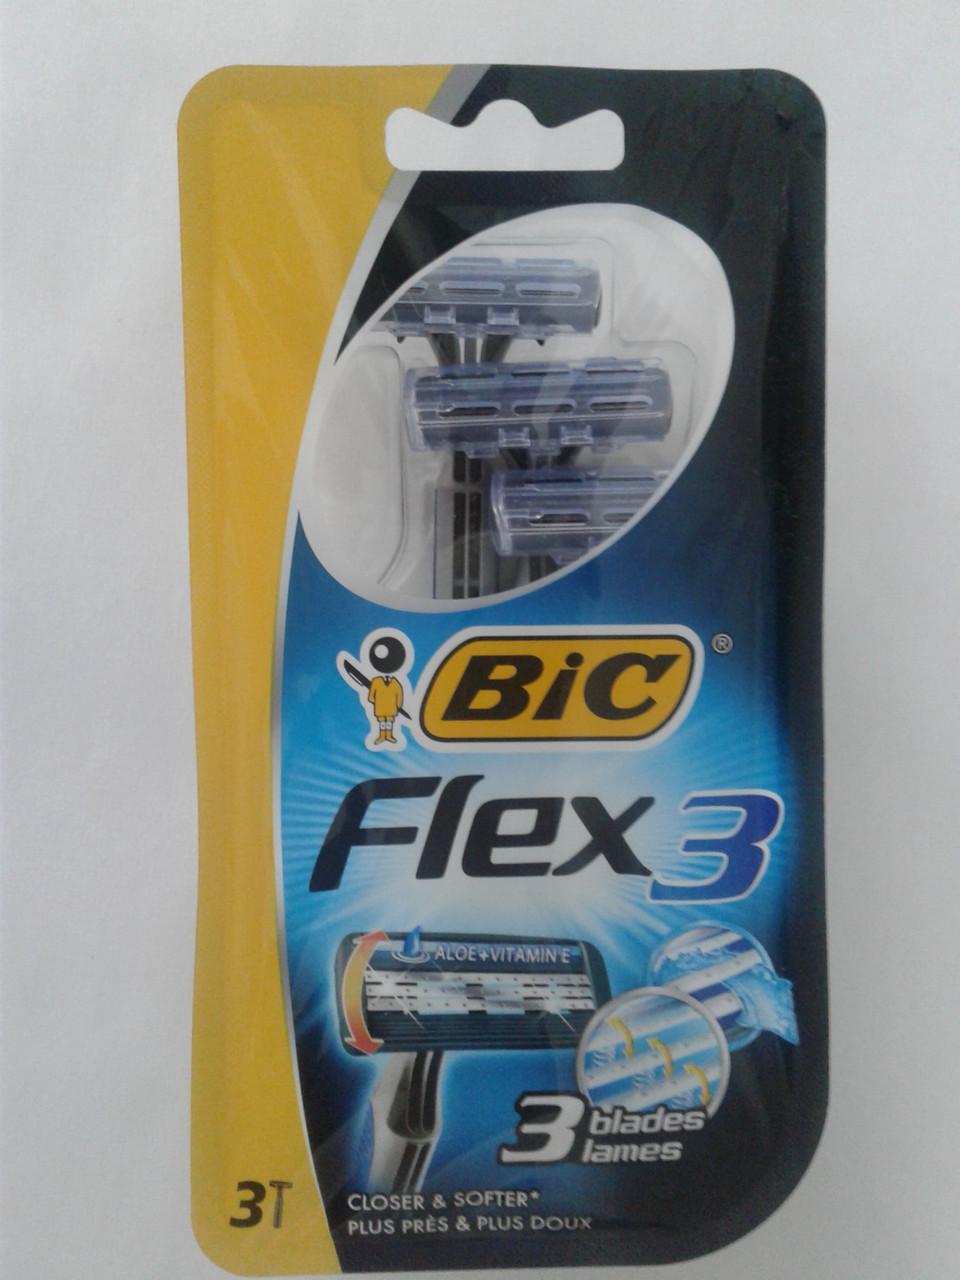 Набор Станков для бритья мужских одноразовых BiC Flex 3 3 шт. (Бик Флекс 3 Пр-во Европа) оригинал